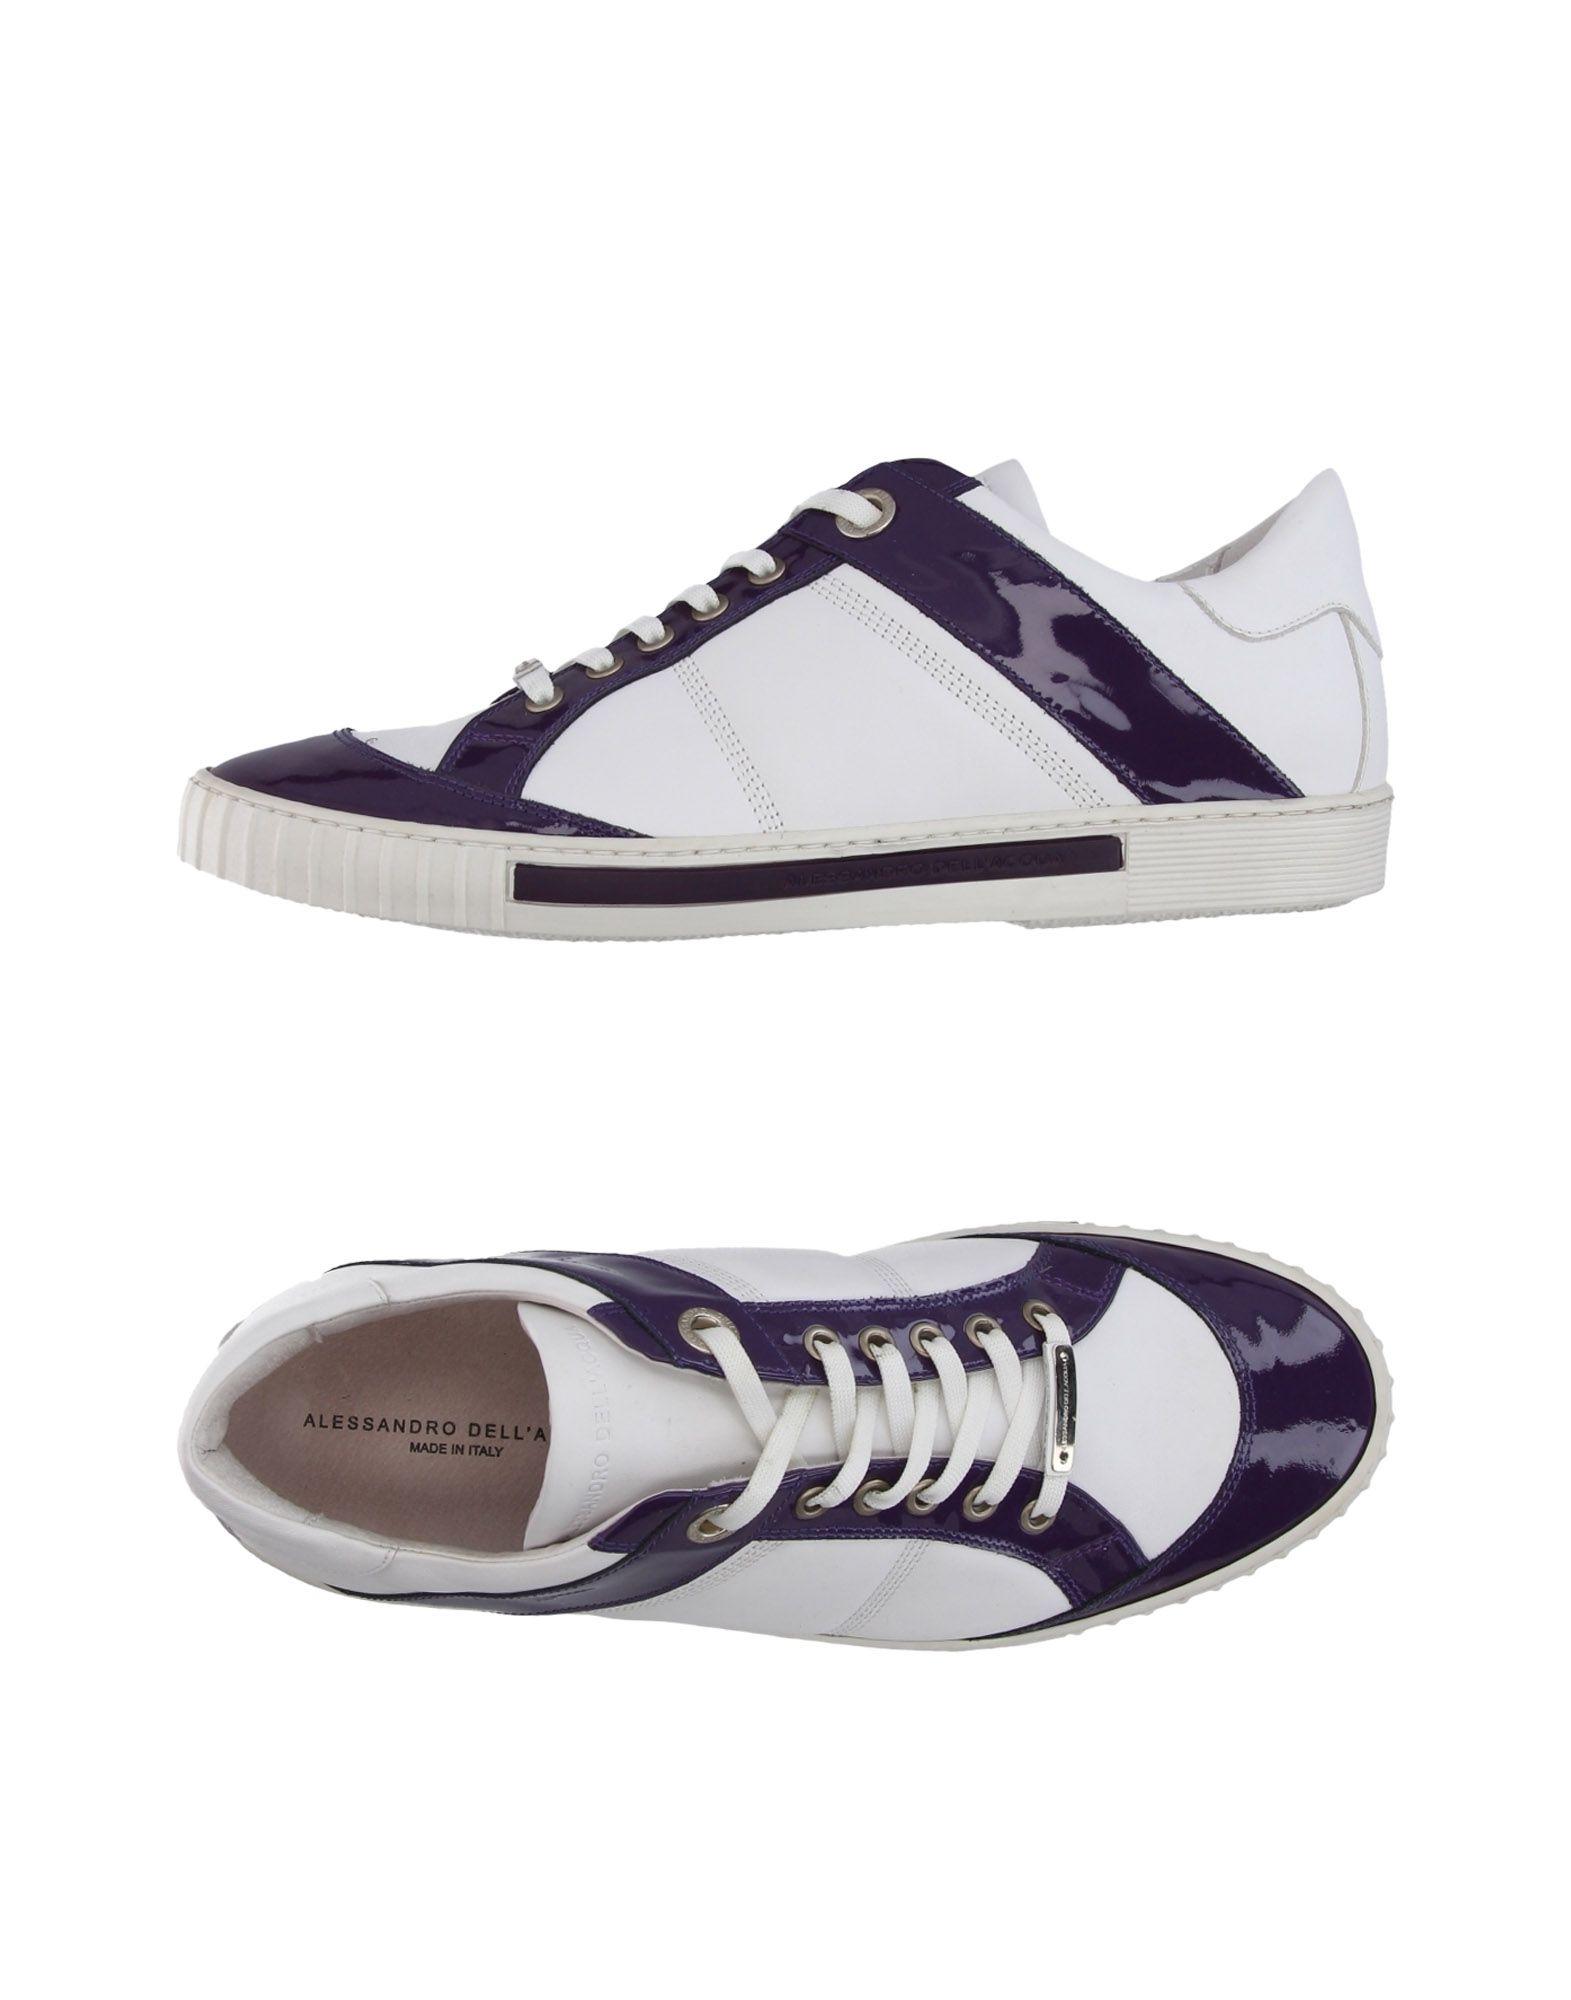 Alessandro Dell'acqua Sneakers Herren  11206978MJ 11206978MJ  544413